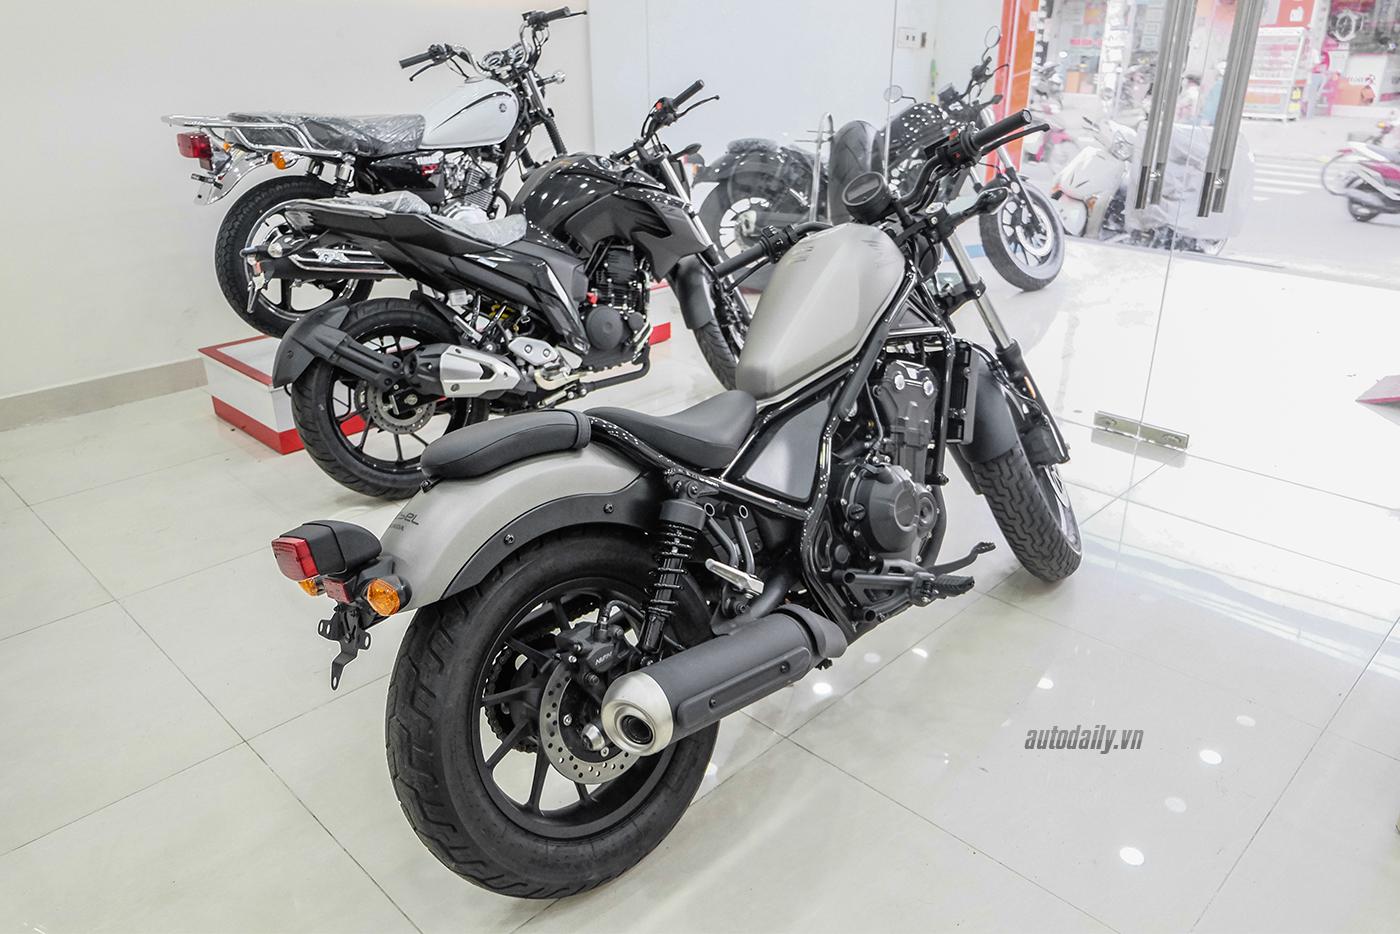 honda-rebel-500-abs-2017-10.jpg